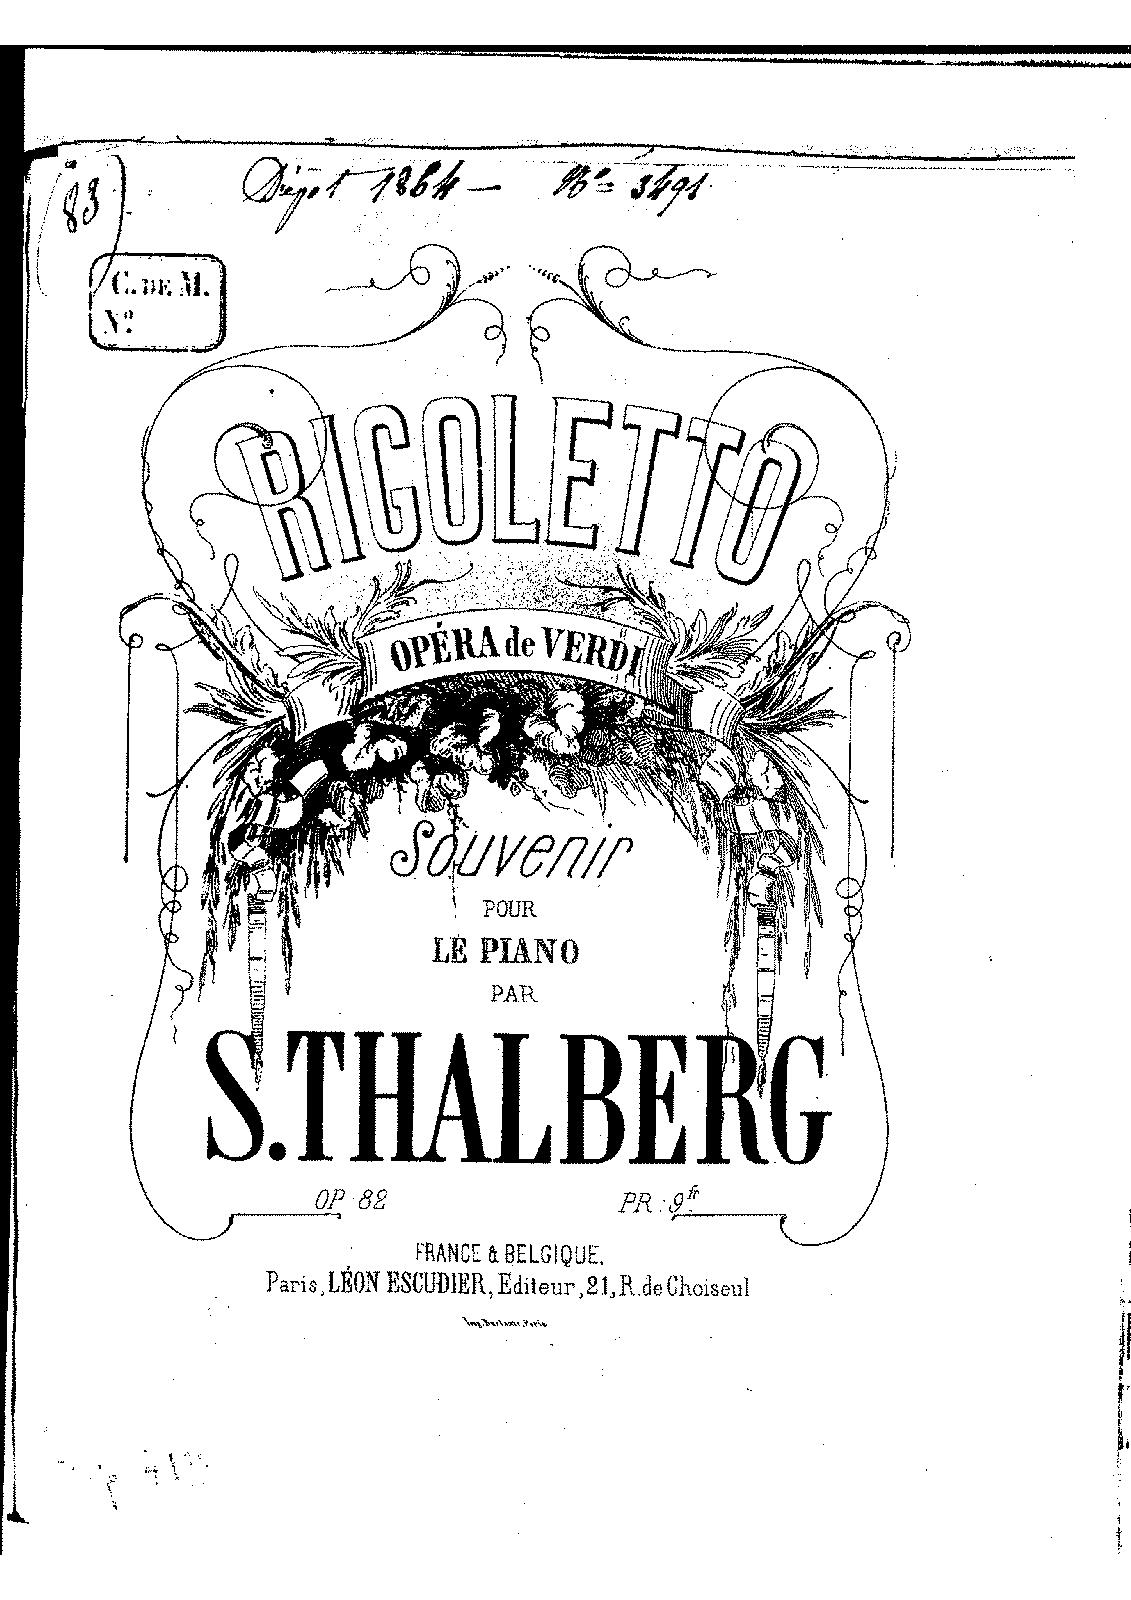 Fantasia on Verdi's 'Rigoletto', Op.82 (Thalberg